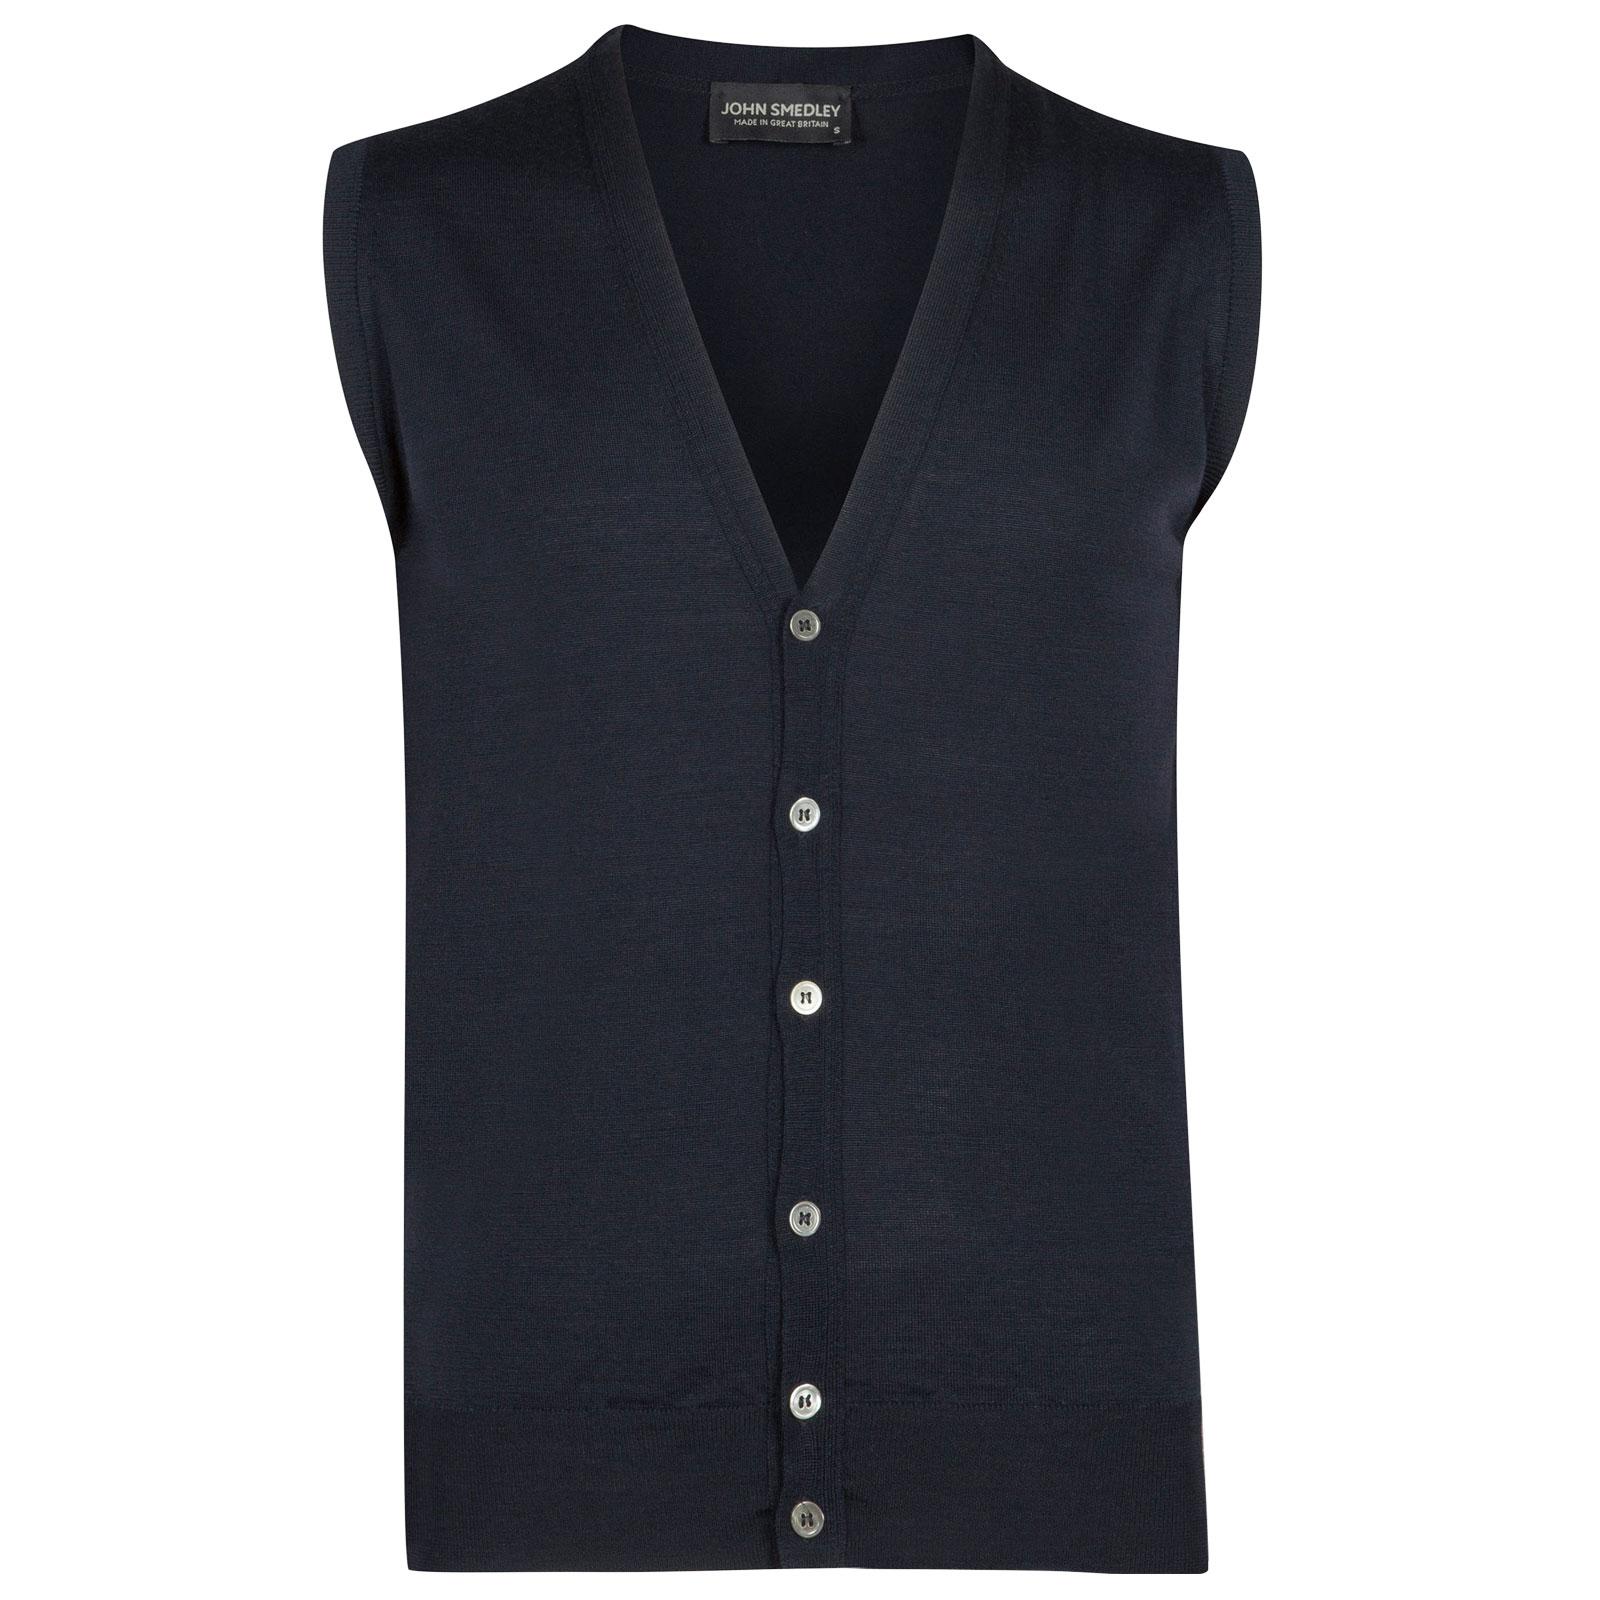 John Smedley huntswood Merino Wool Waistcoat in Midnight-XXL